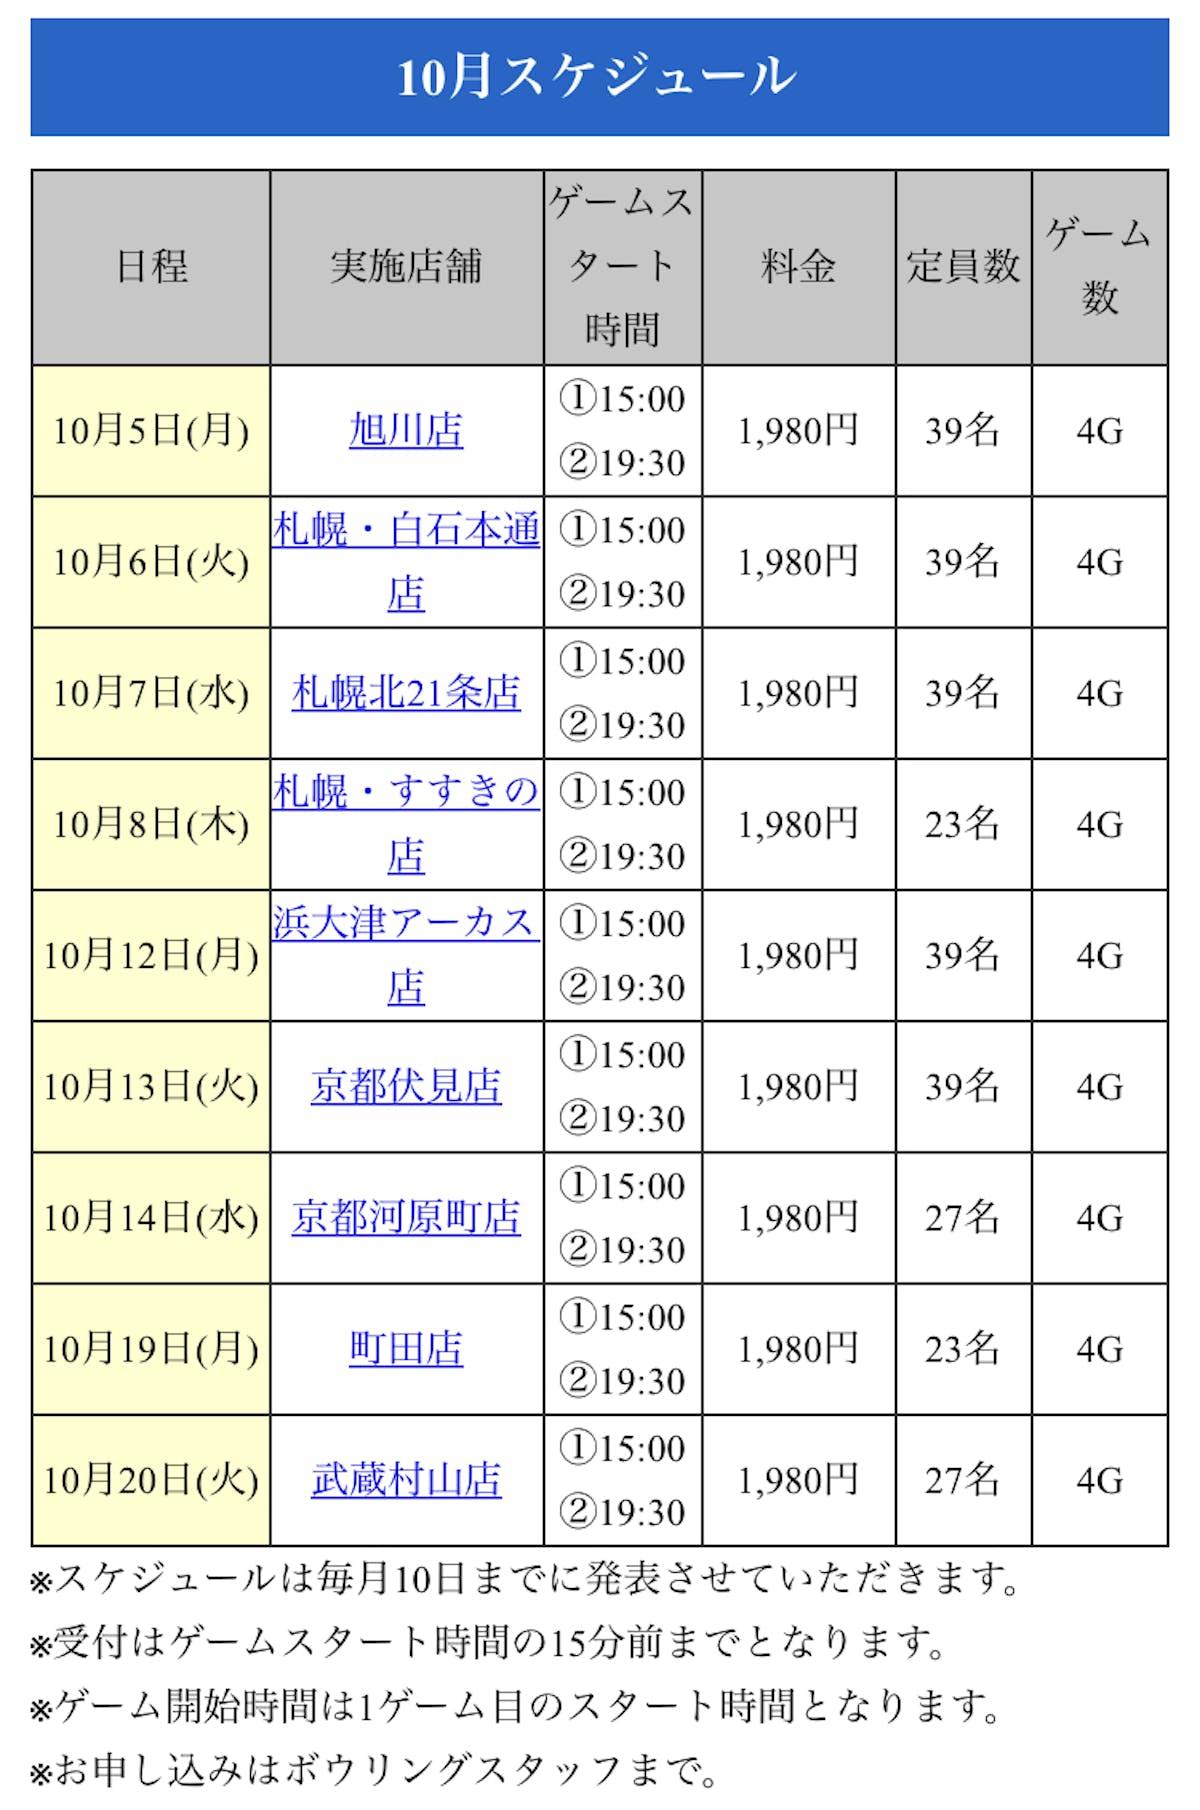 93742854-F191-442E-875C-7262C0B31F73.jpeg